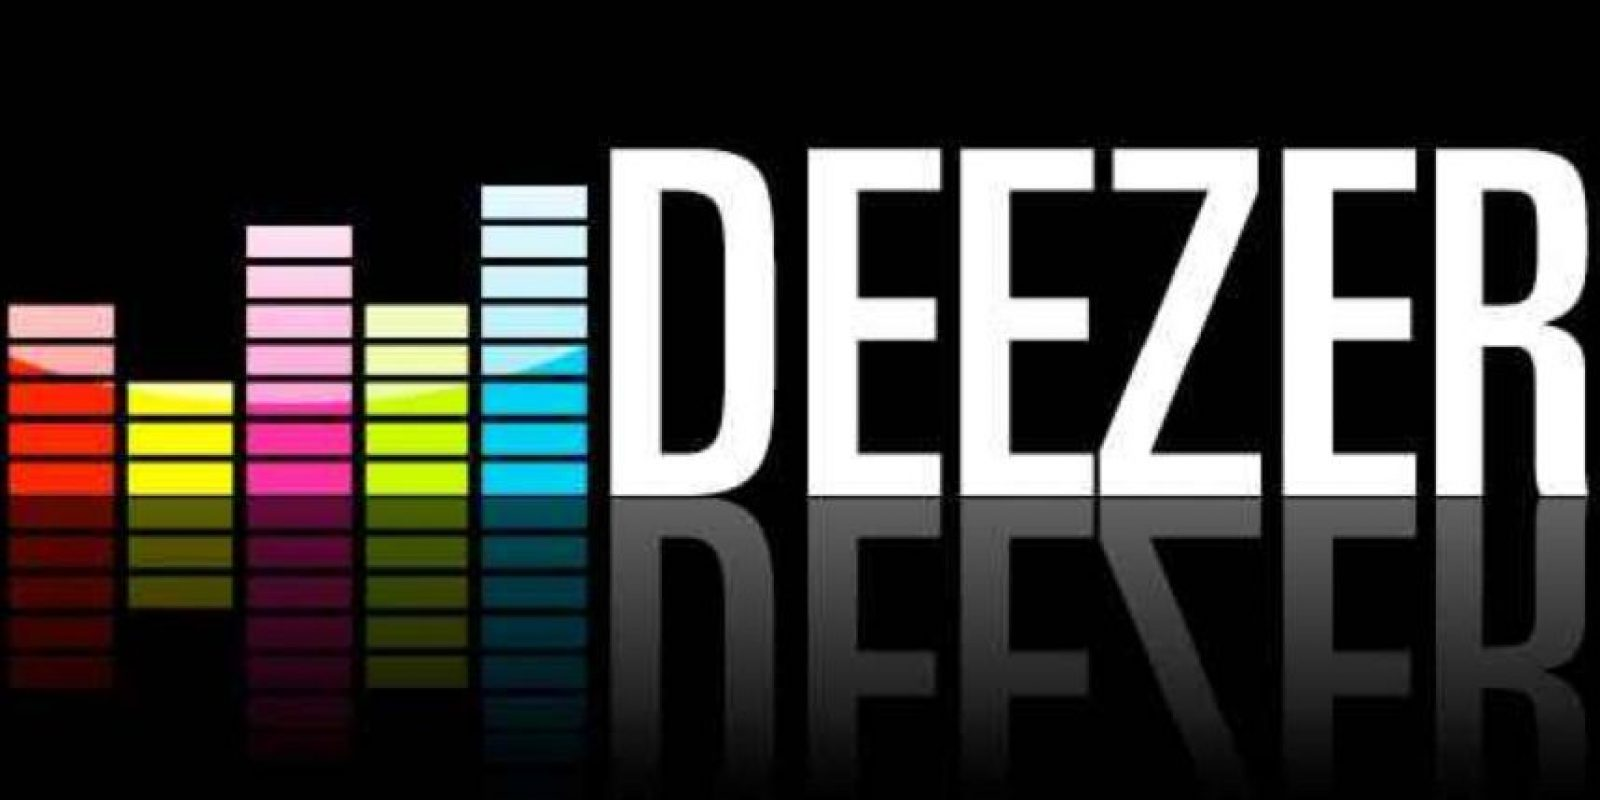 Deezer fue fundado en 2006 en Francia po Daniel Marhely y Jonathan Benassaya. Foto:Deezer